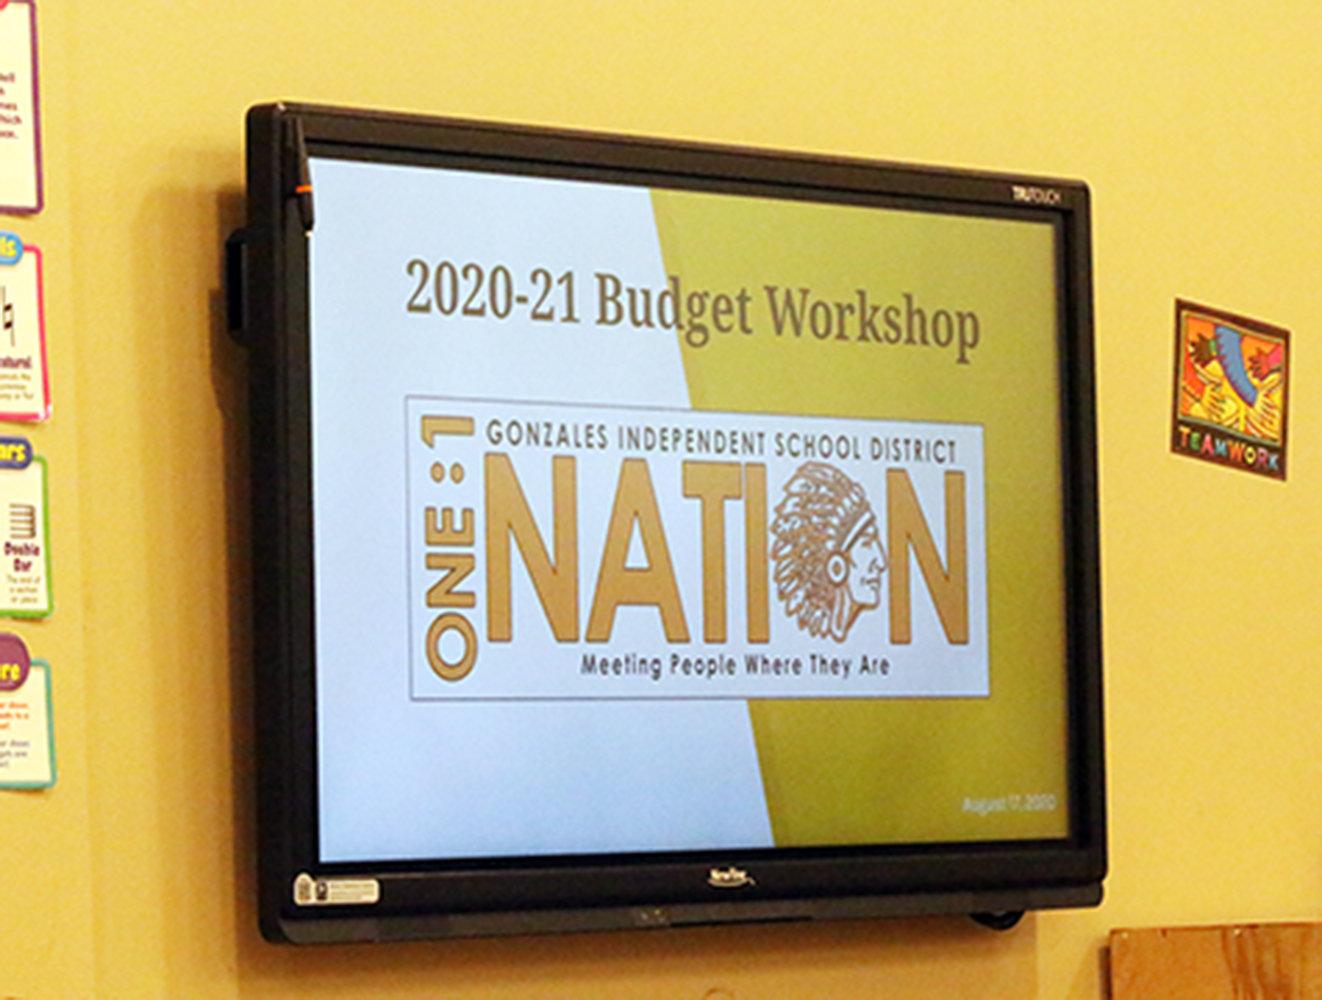 Gisd Calendar 2021 GISD adopts new calendar, presents budget at special meeting | The